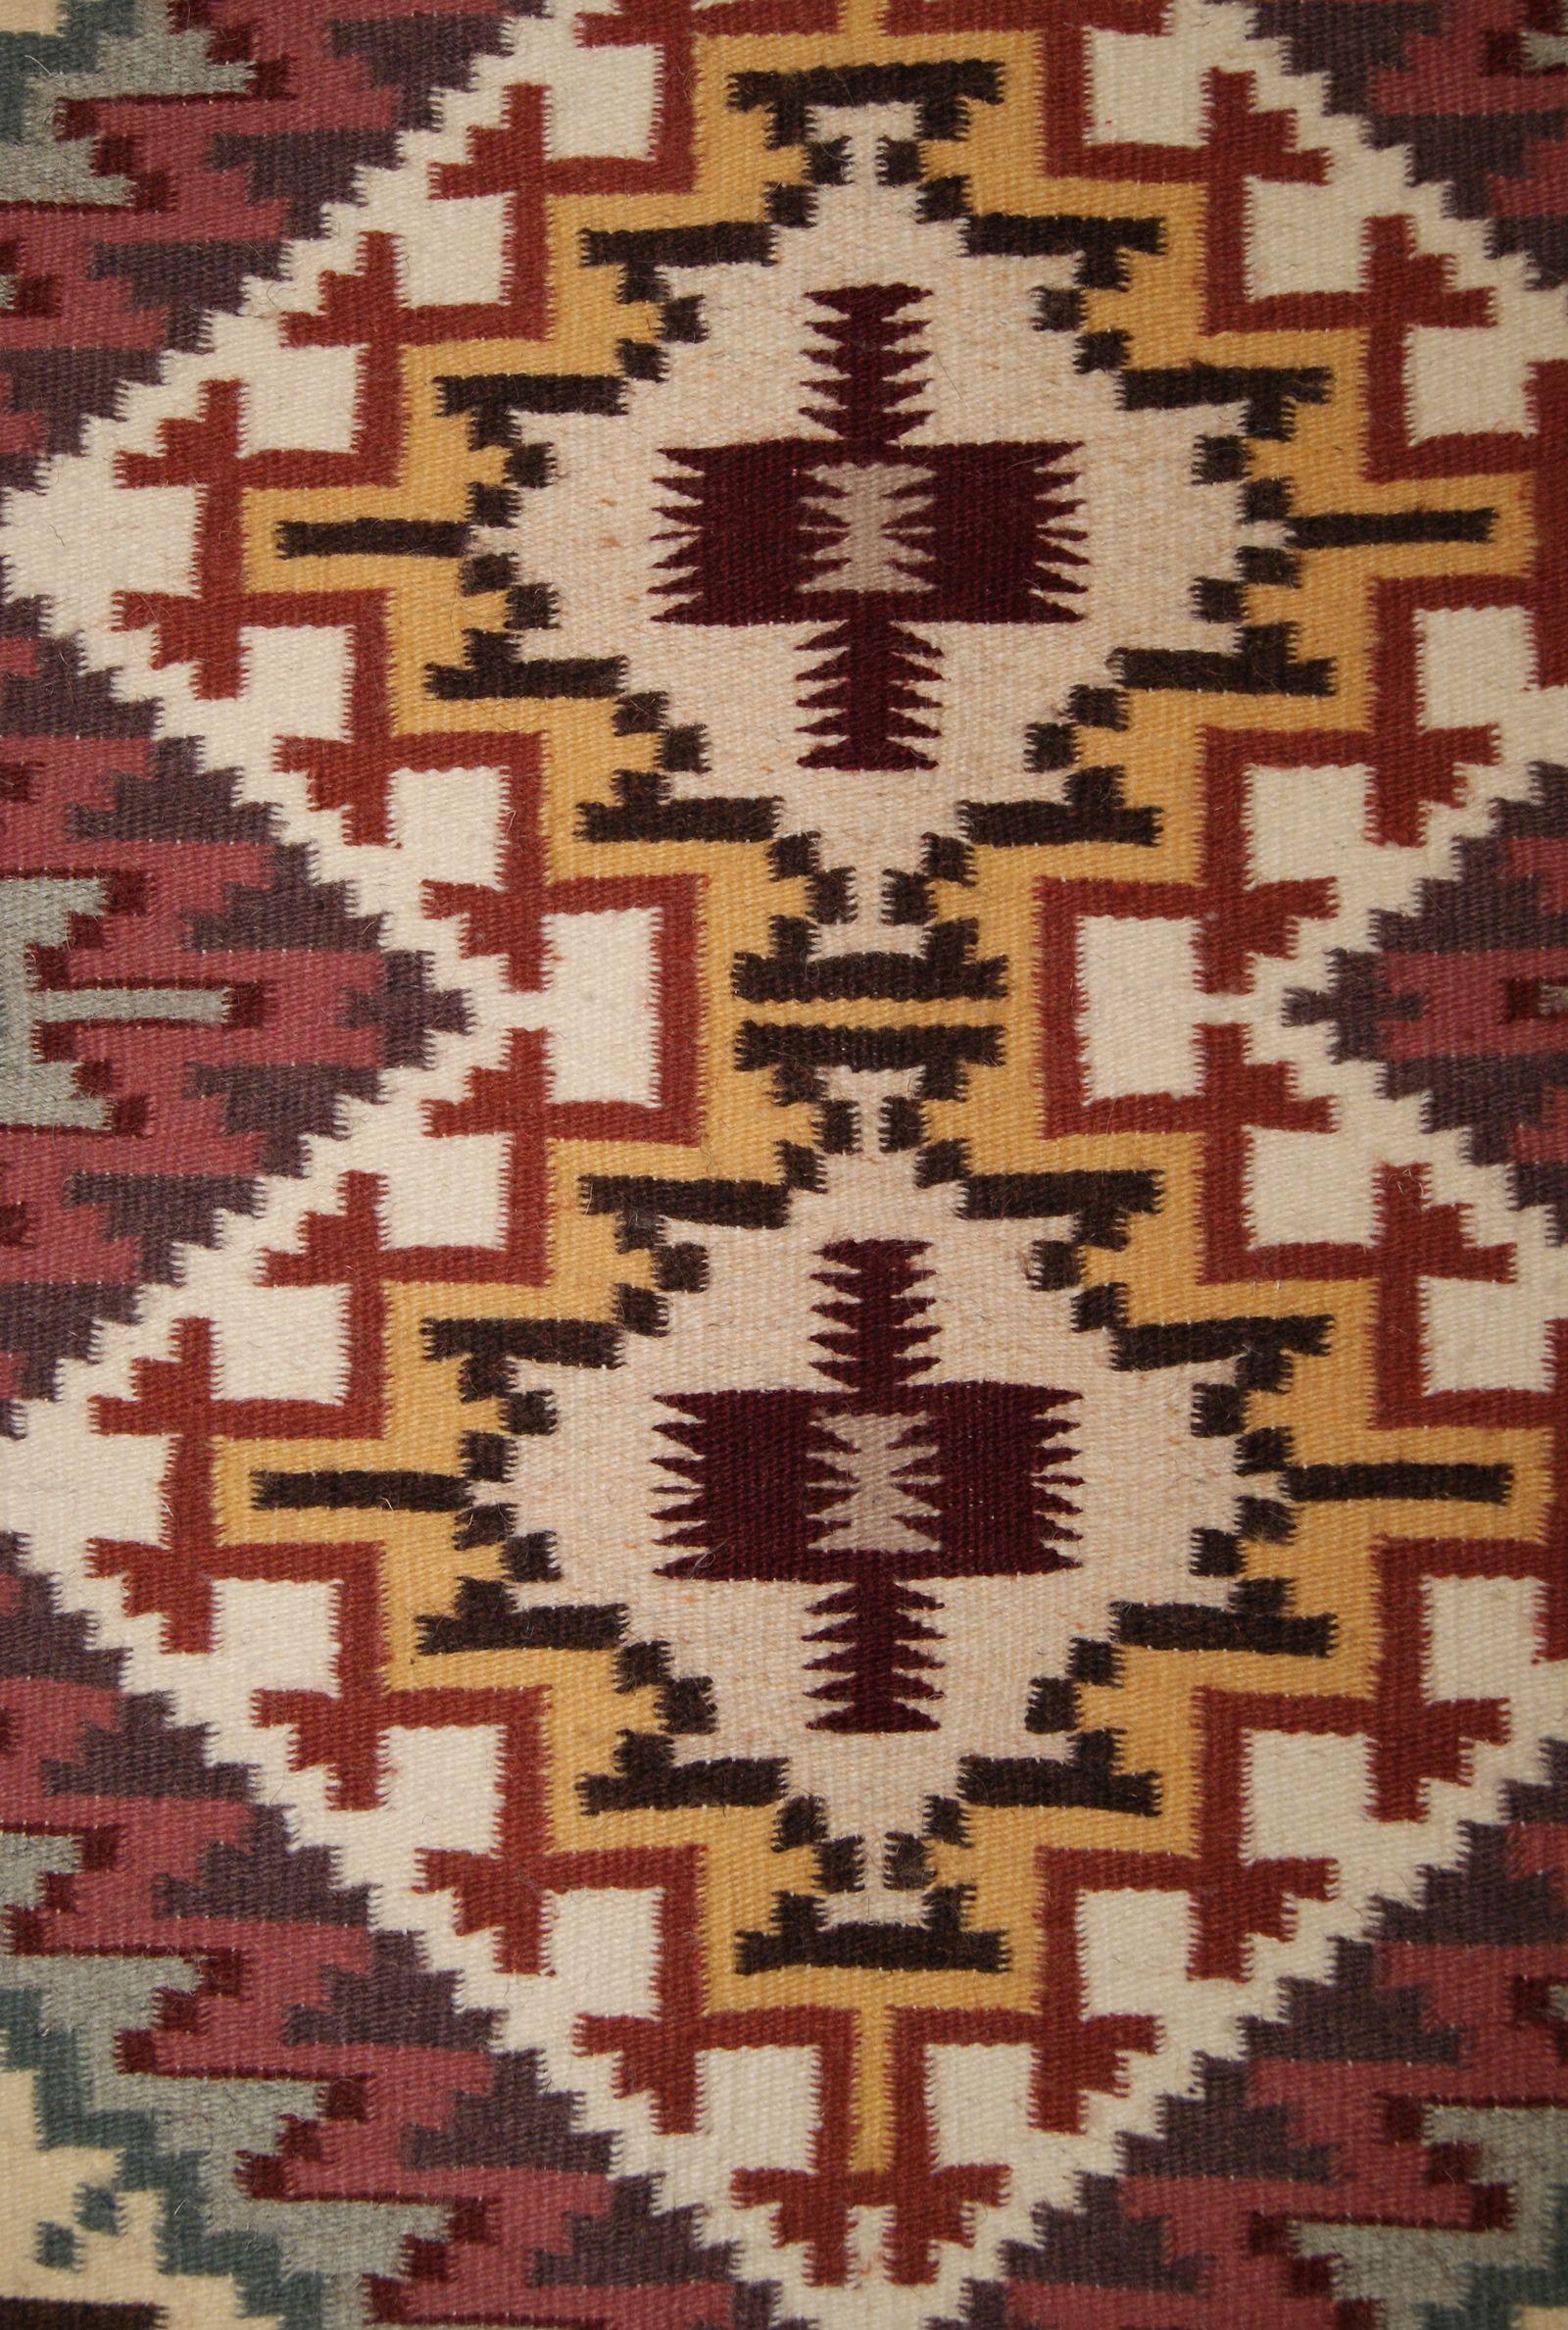 Burntwater Navajo Weaving For Sale Kilim Weaving 2 Motifs